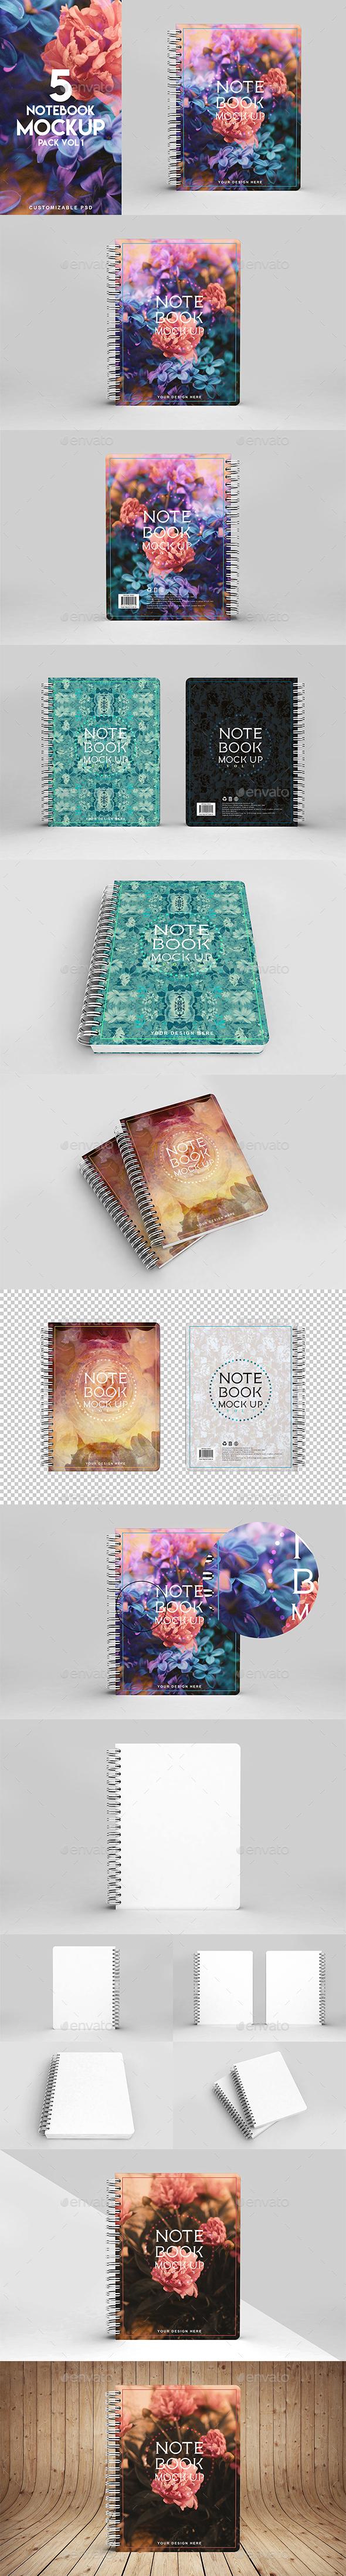 Notebook Mockup Vol 1 - Product Mock-Ups Graphics